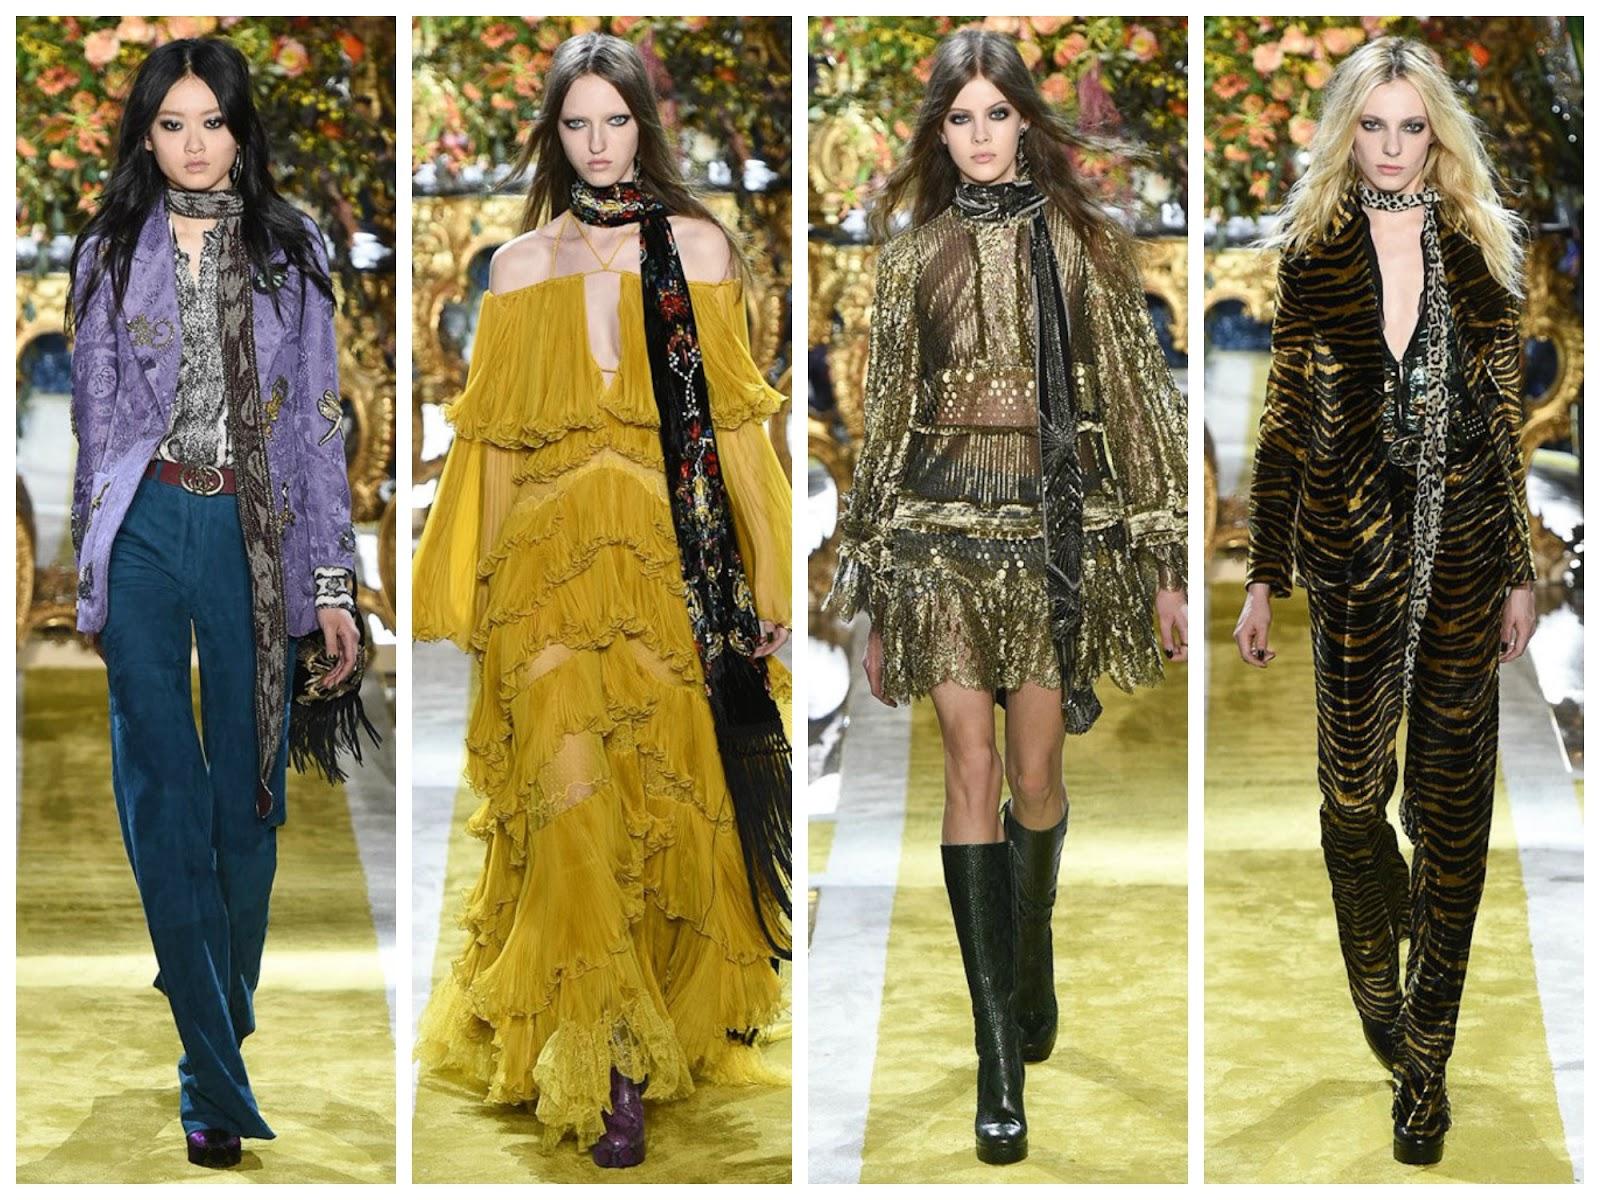 roberto-cavalli-fall-winter-2016-fashion-show-milan